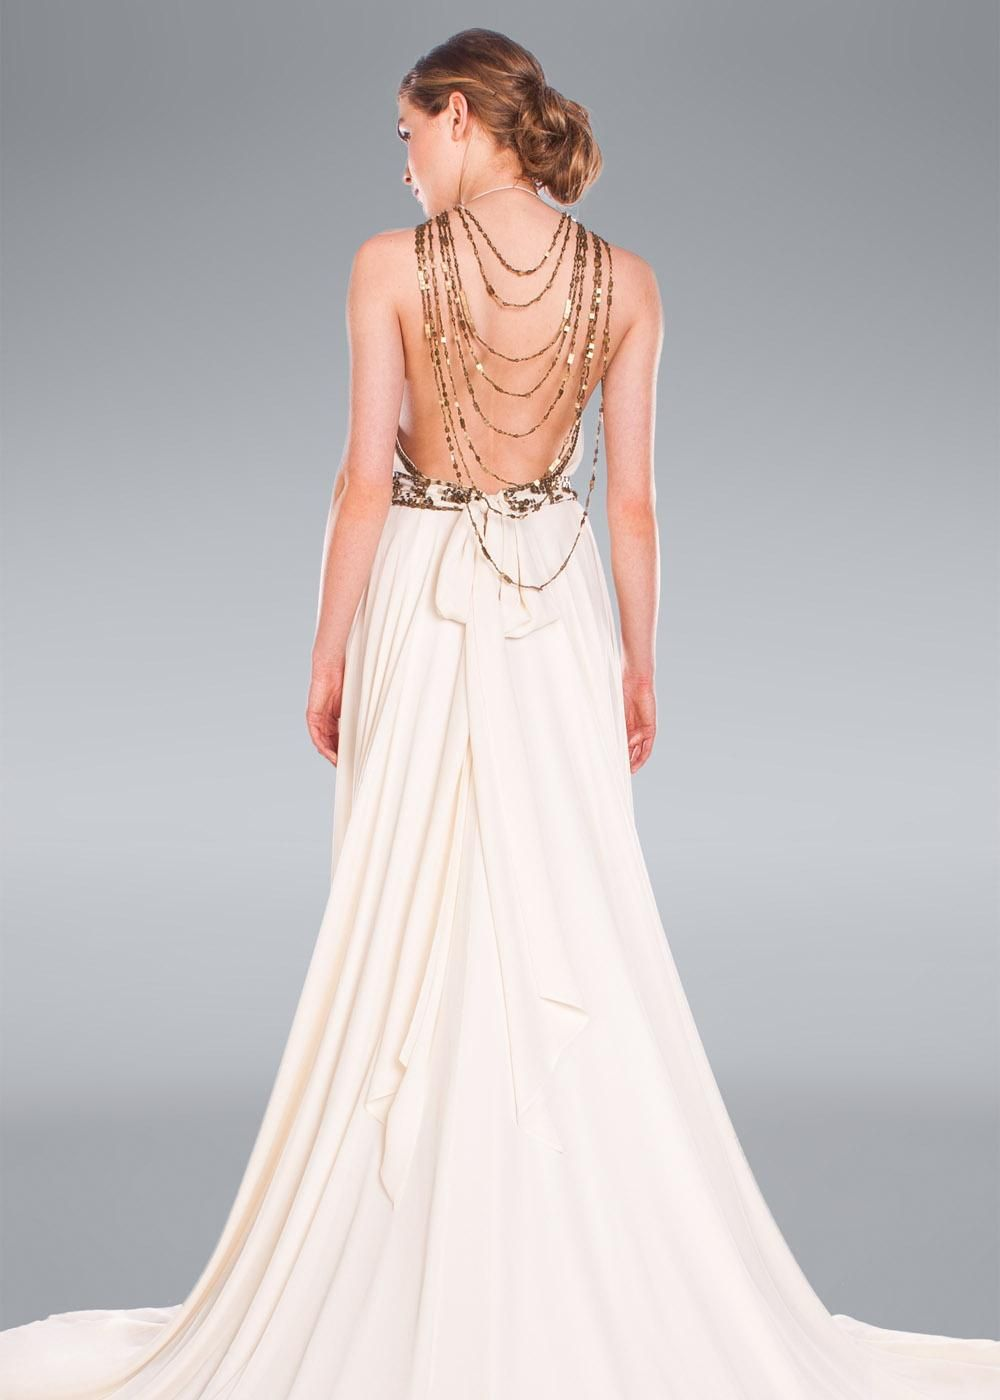 Cleopatra wedding dress amanda wakeley designer